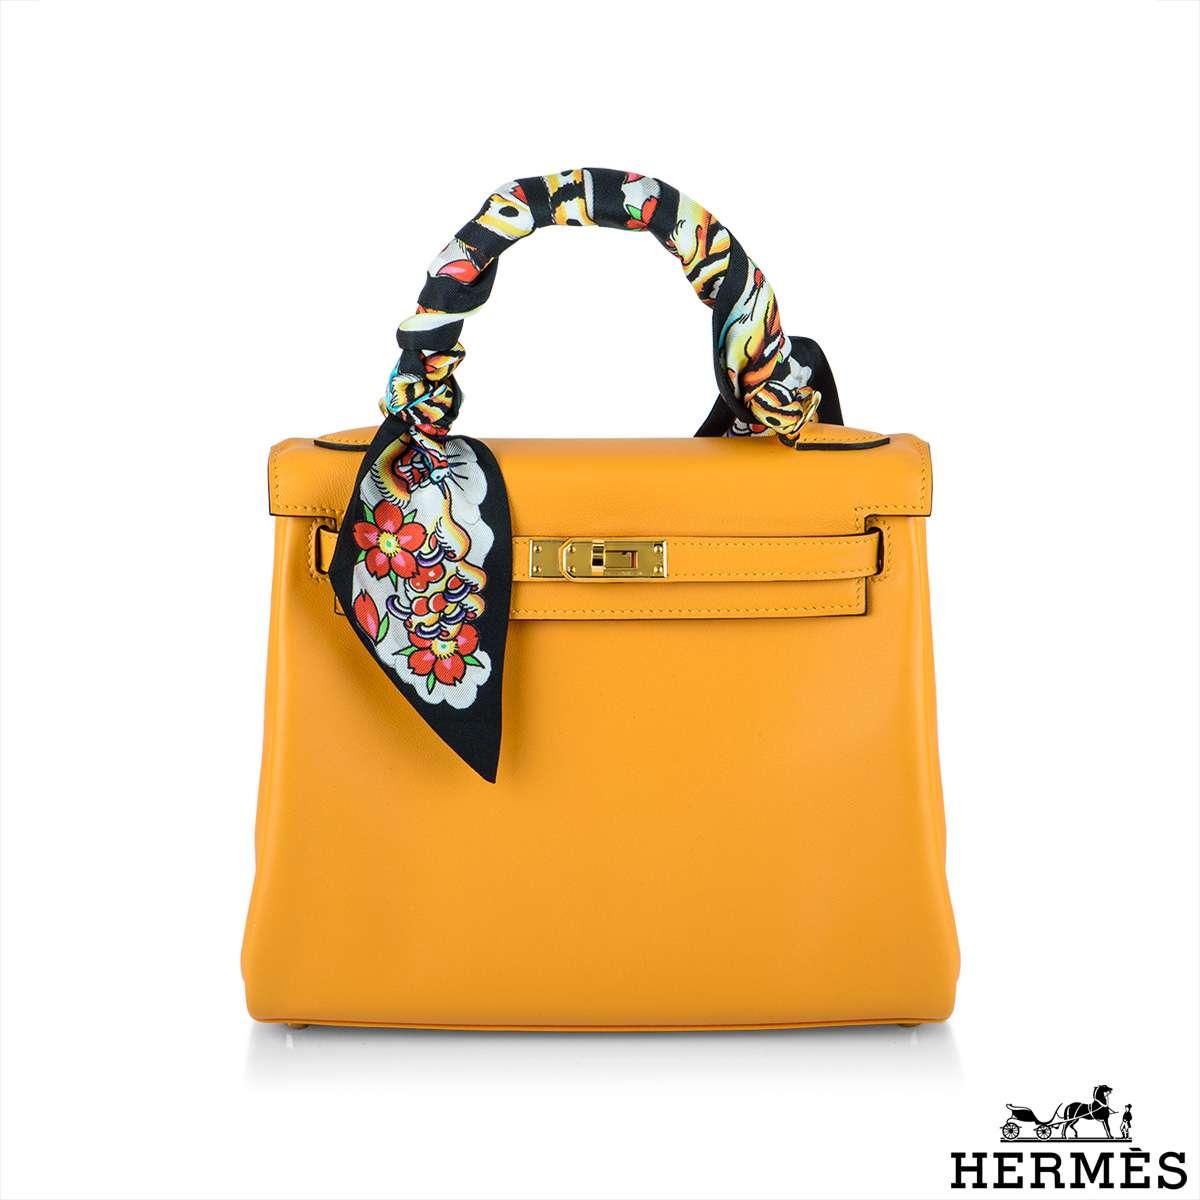 Hermès Kelly 25cm HSS Jaune Dor GHW Handbag